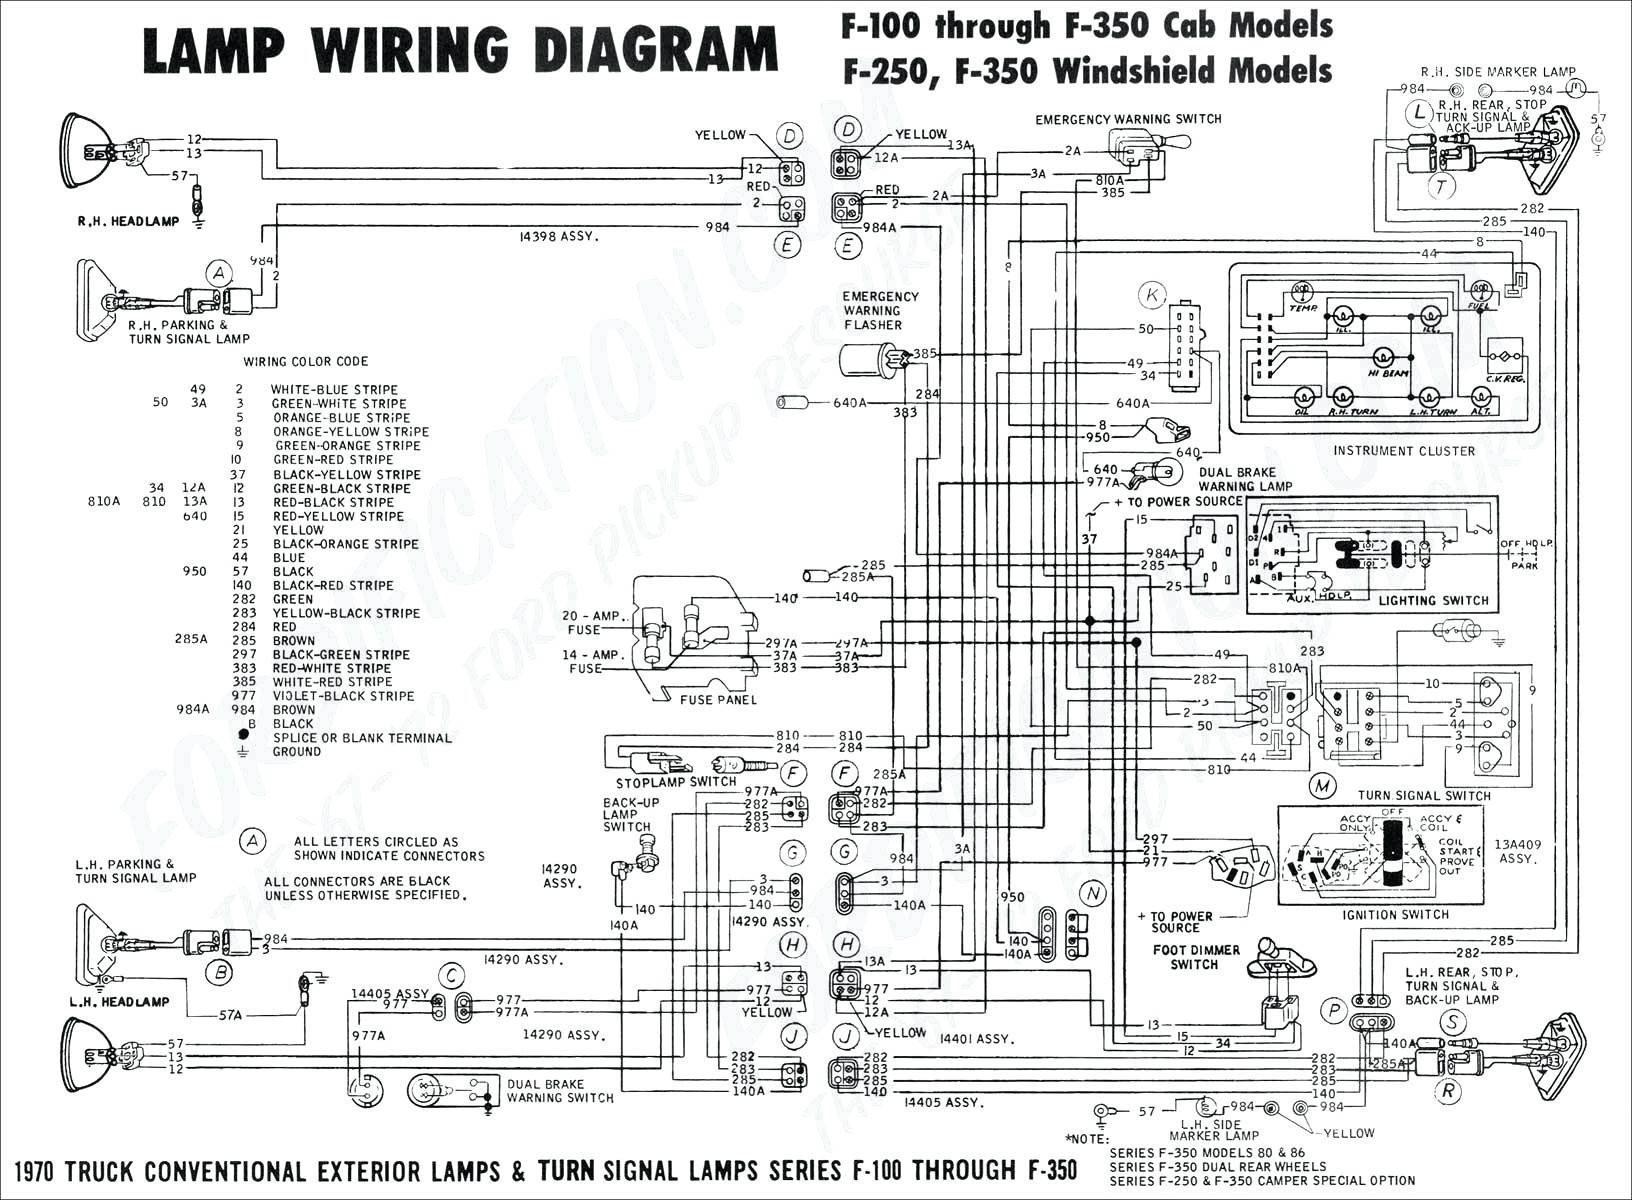 Car Engine Parts with Diagram 2001 Dodge Durango Parts Diagram Start Building A Wiring Diagram • Of Car Engine Parts with Diagram